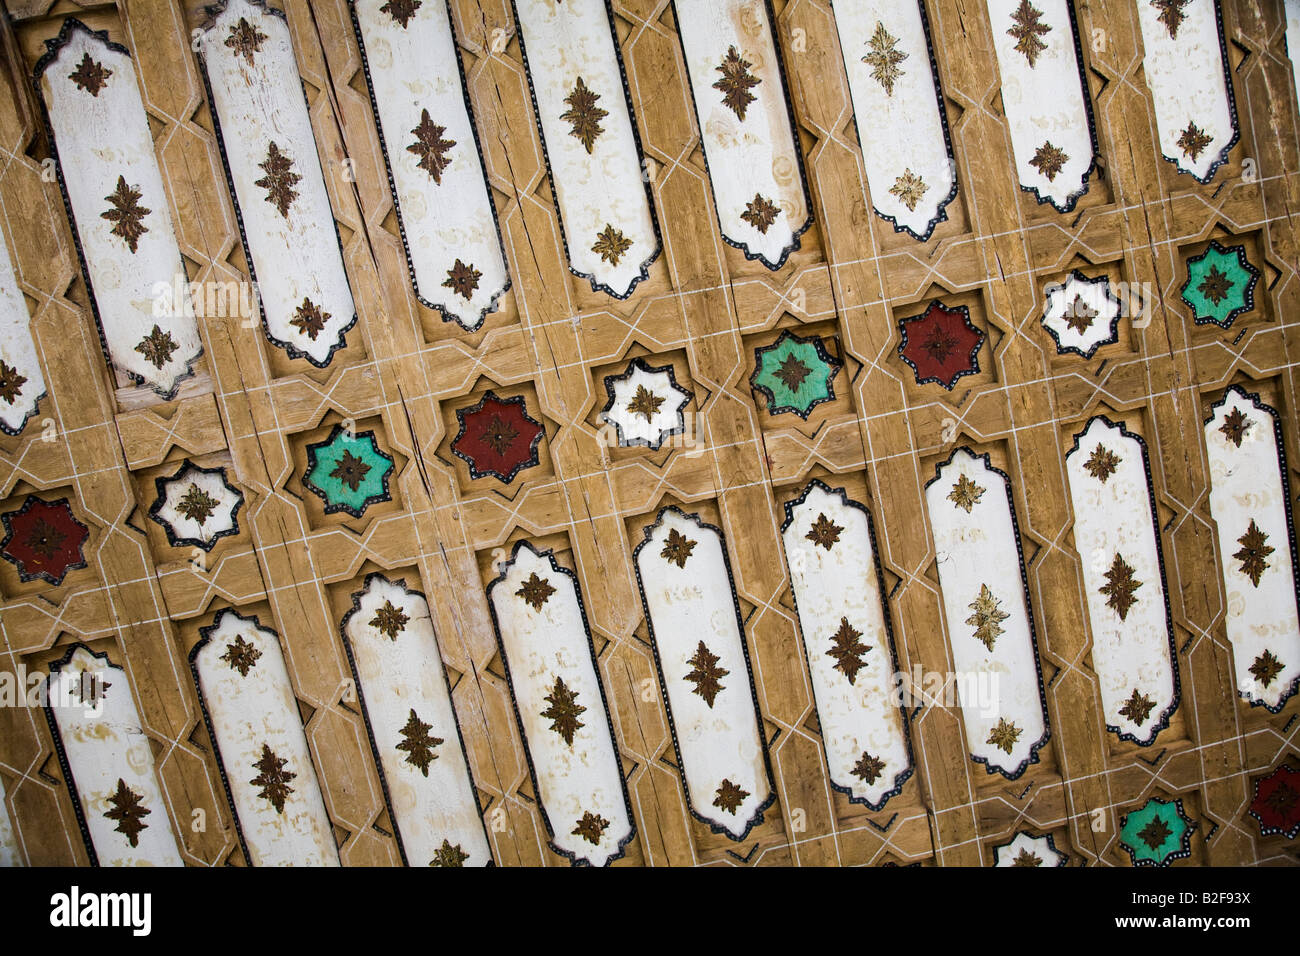 SPAIN Salamanca Mudejar design on coffered ceiling of walkway at University of Salamanca stars inlaid between strips - Stock Image